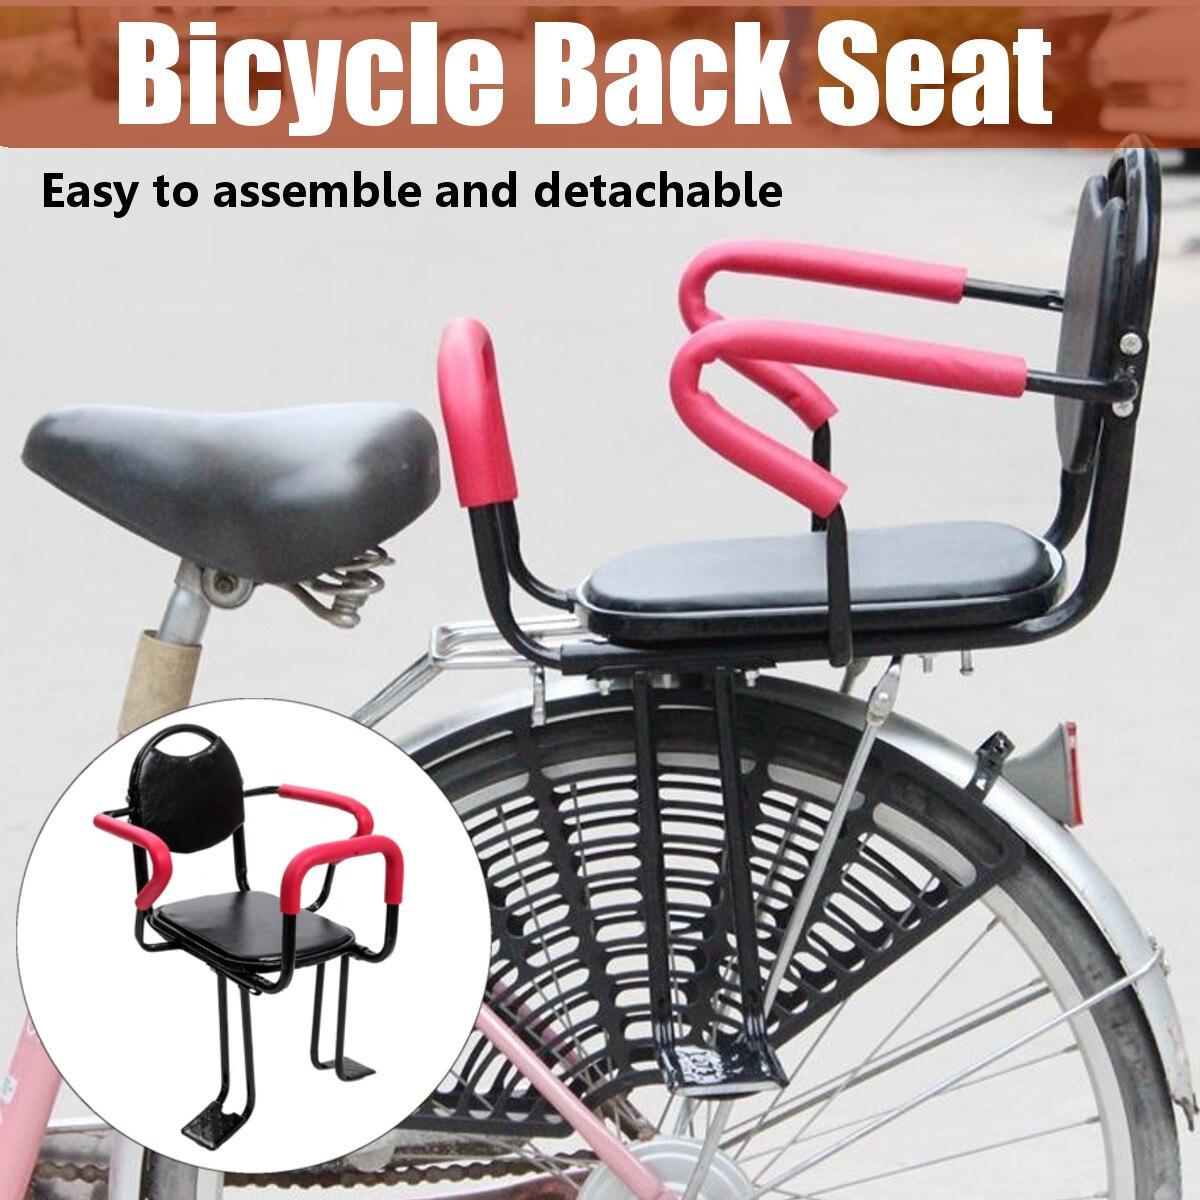 Tivolii Bicycle Saddle Cushion for MTB Mountain Road Bicycle Bike Riding Cycling Hollow Saddle Seat Cushion Soft Bicycle Saddle